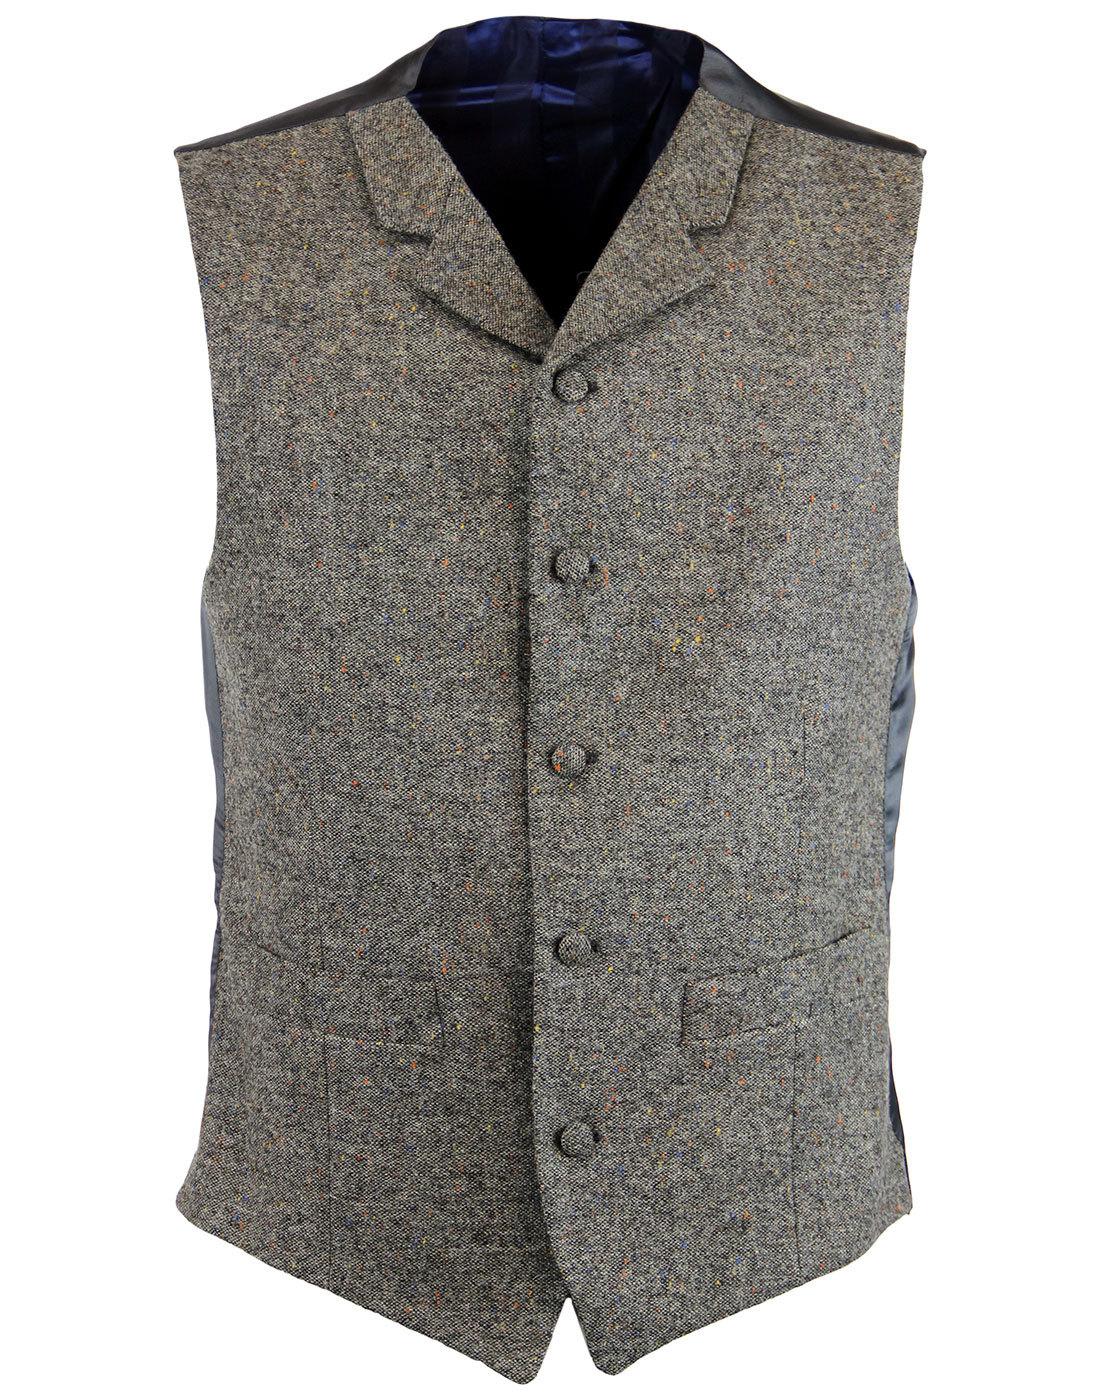 madcap england mod donegal high fasten waistcoat